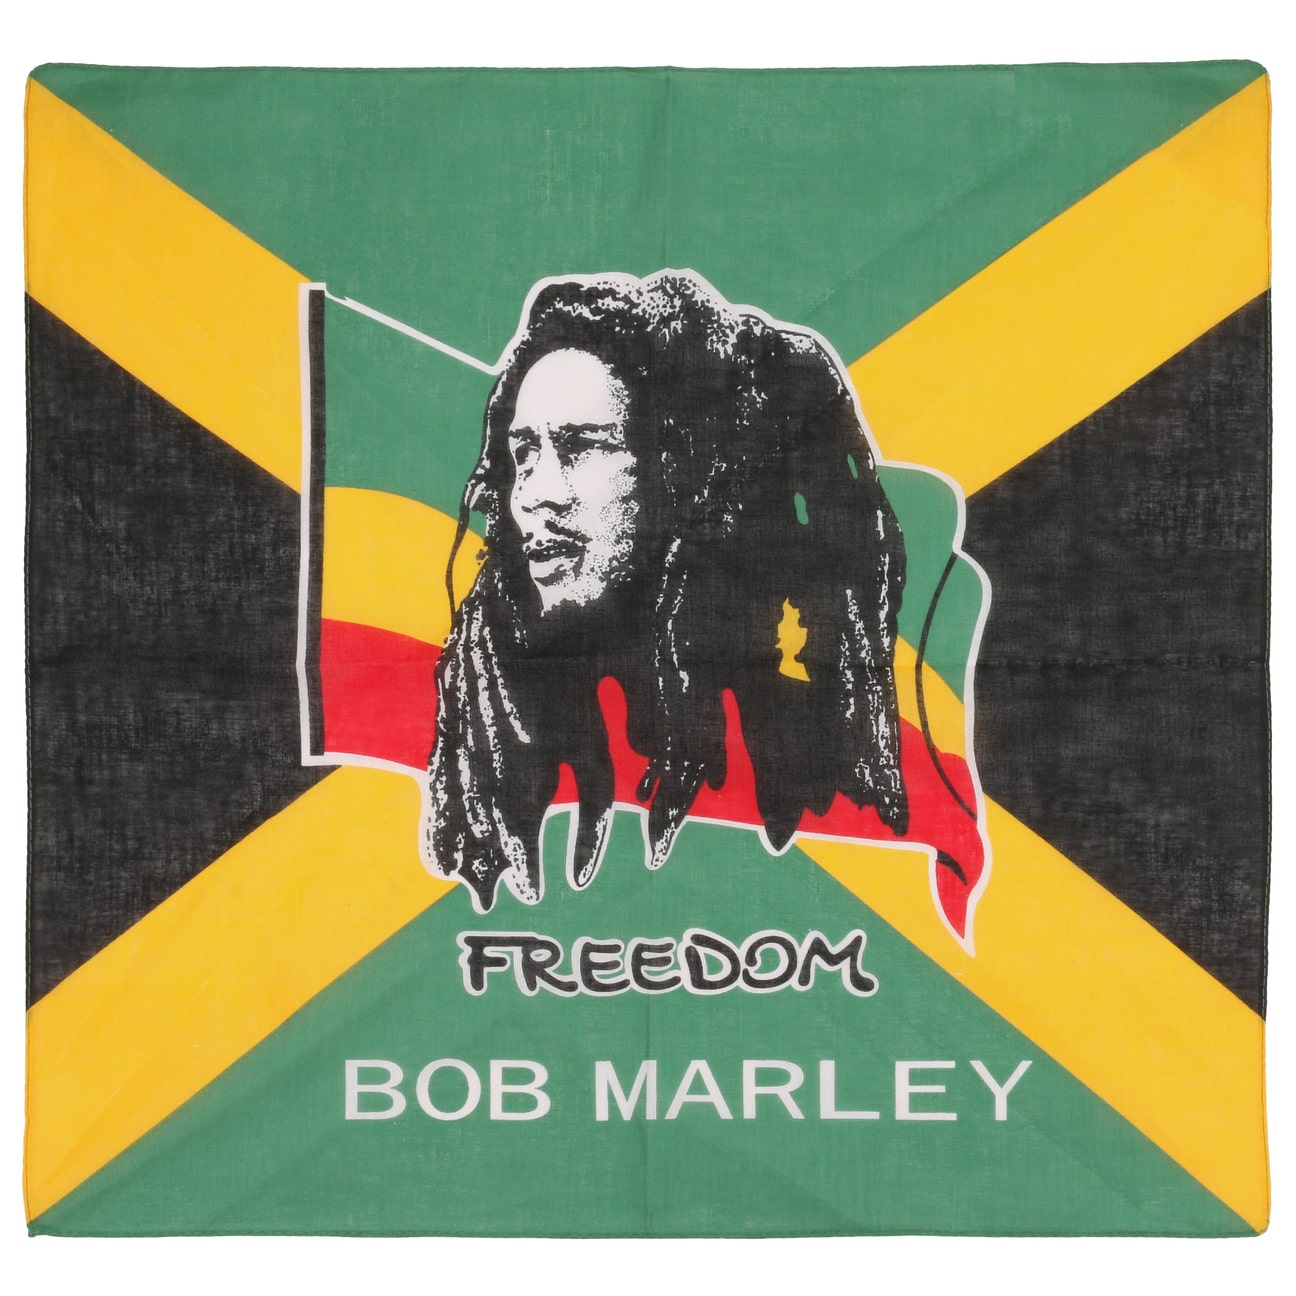 Bandana Jamaica by Lipodo